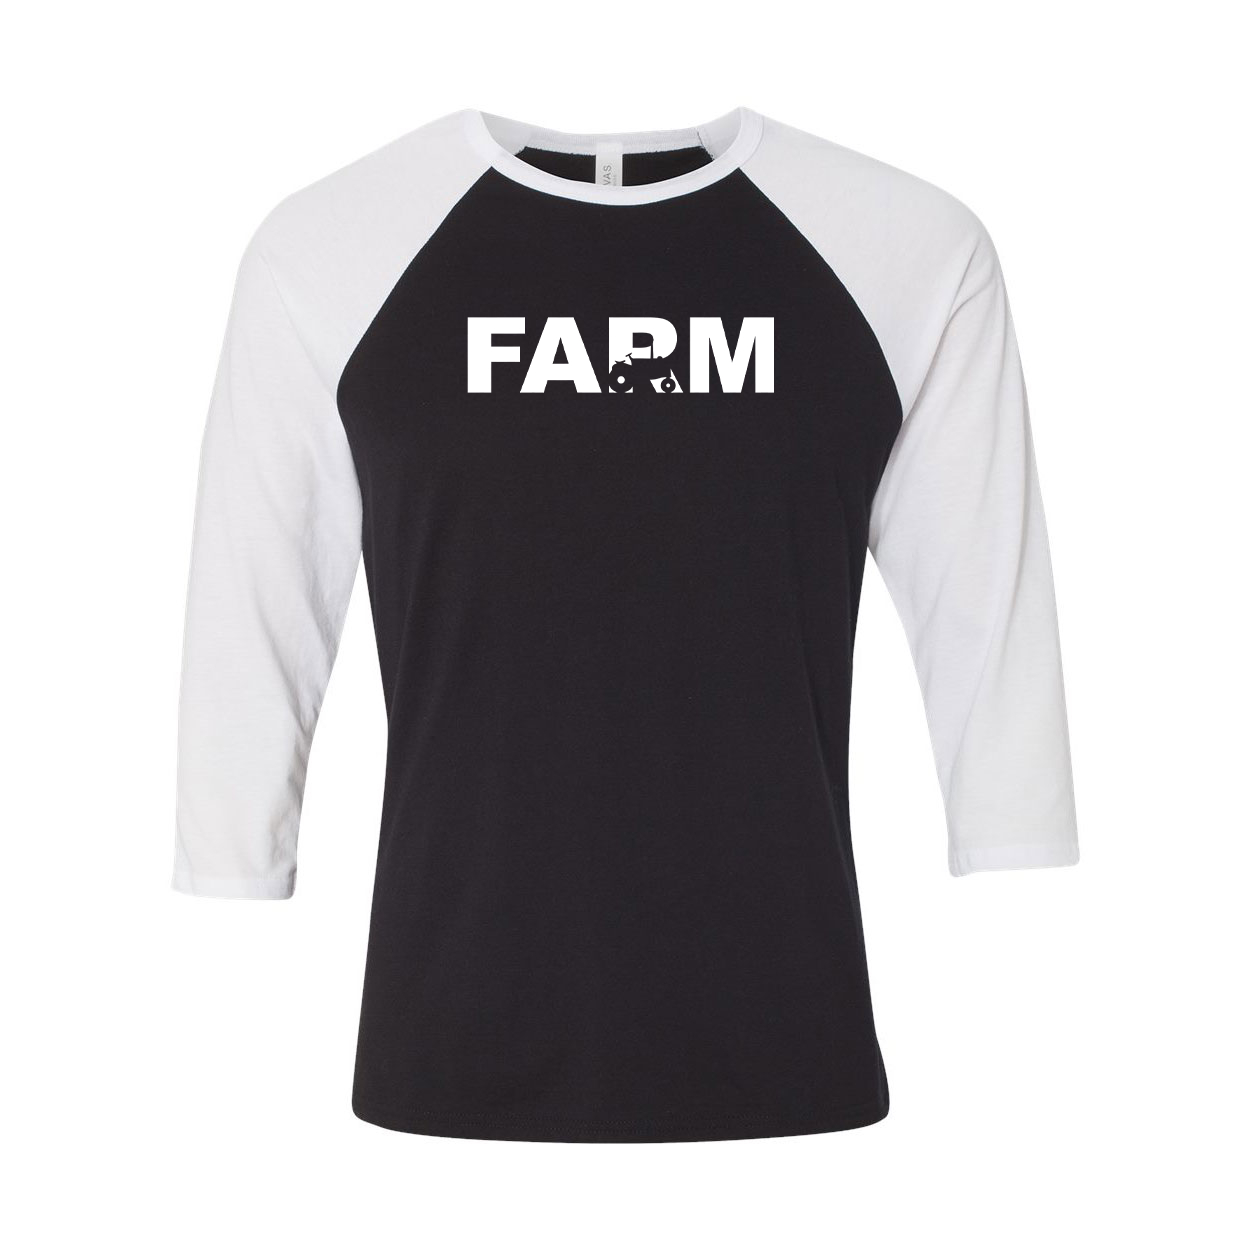 Farm Tractor Logo Classic Raglan Shirt Black/White (White Logo)